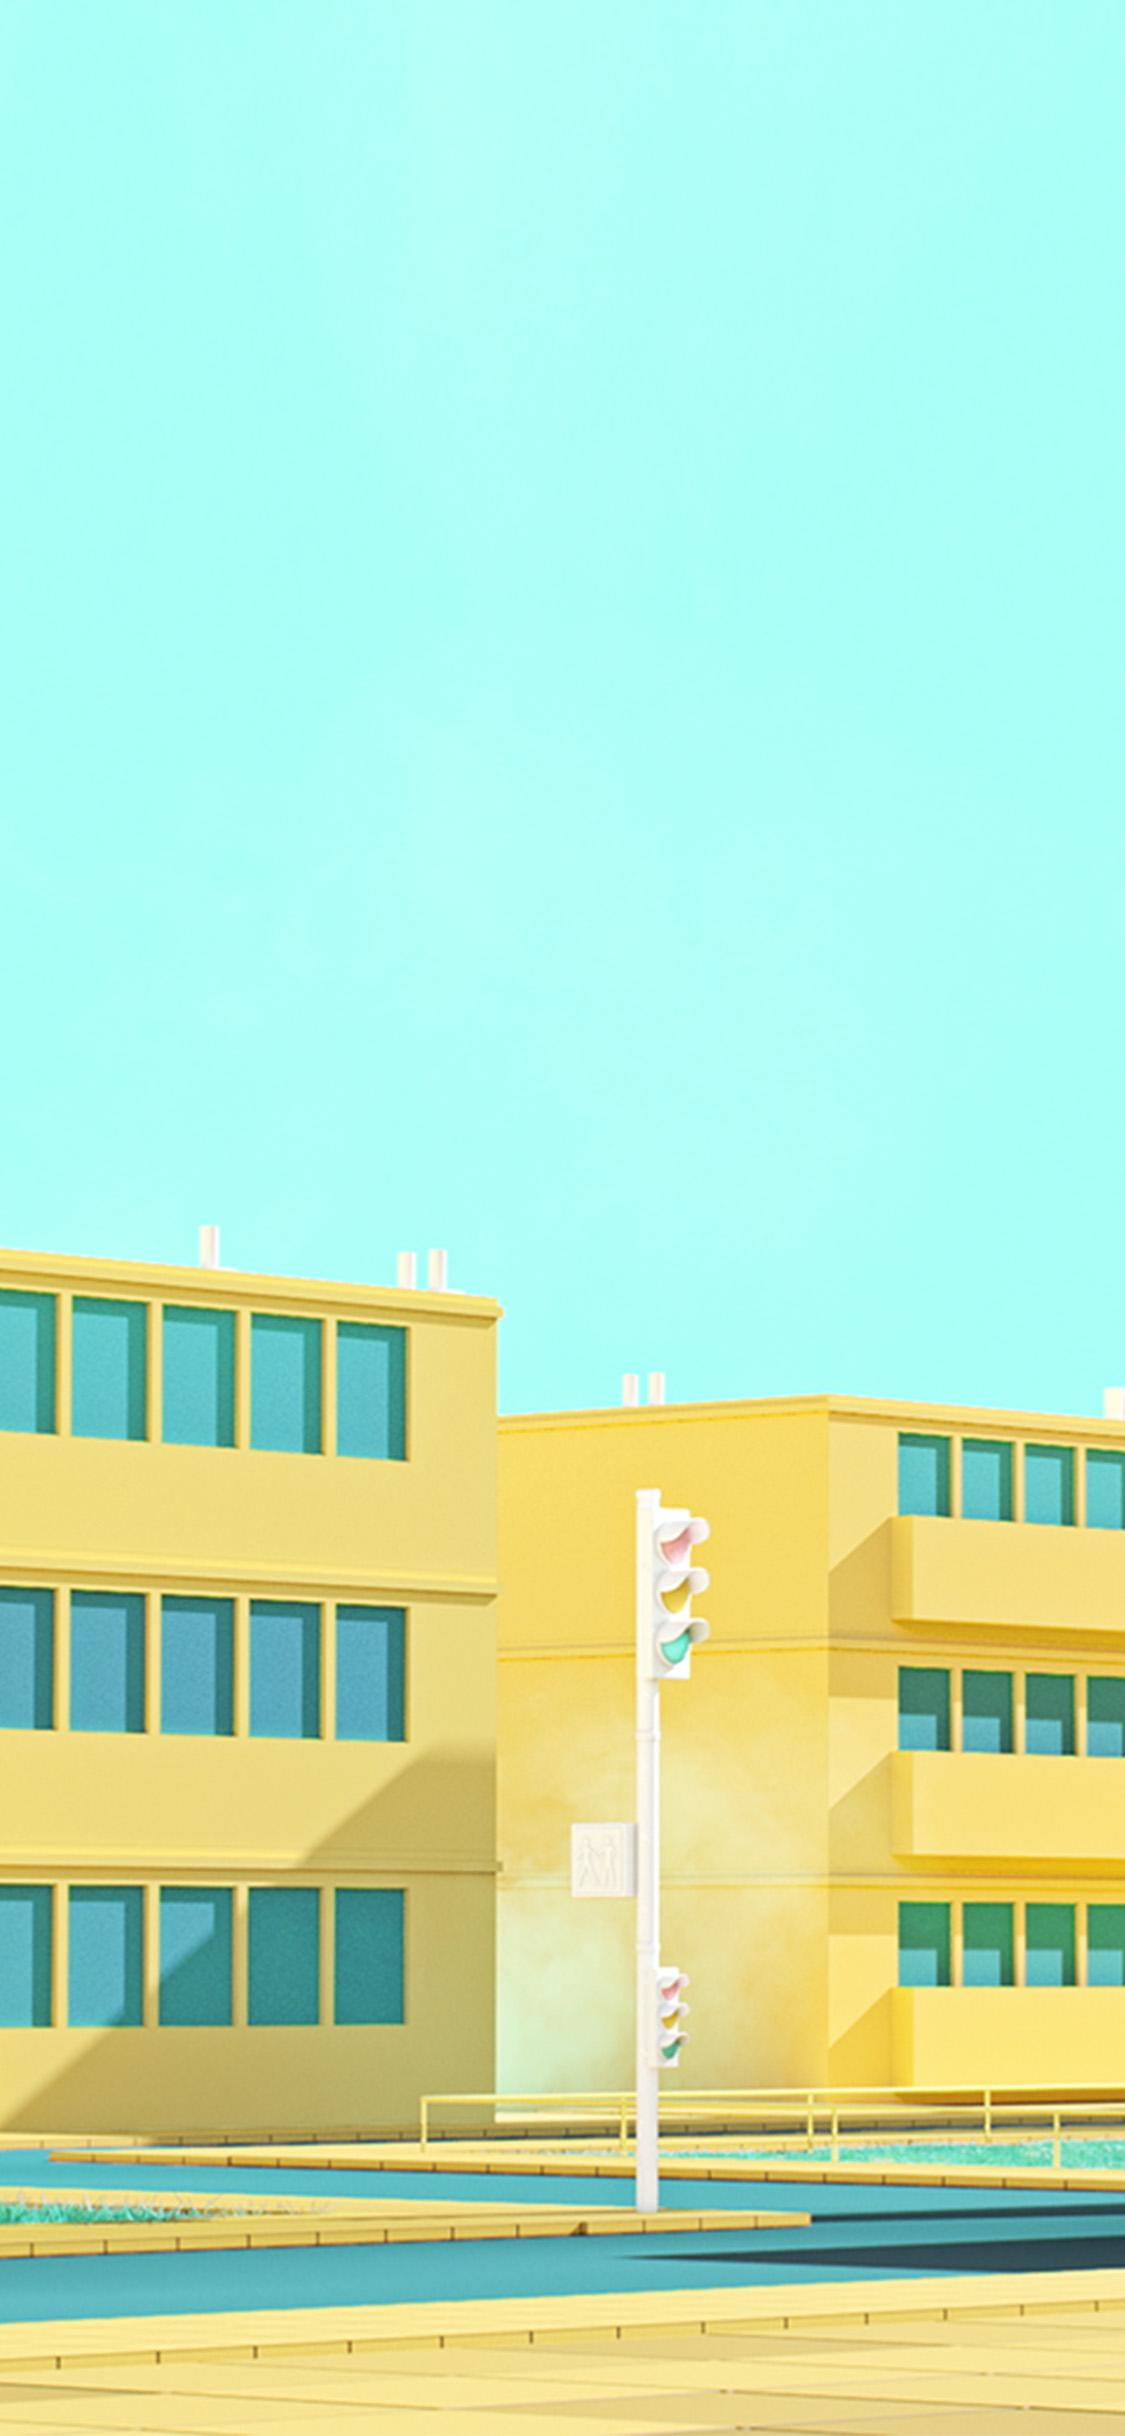 iPhonexpapers.com-Apple-iPhone-wallpaper-bf54-school-anime-illust-yellow-minimal-simple-art